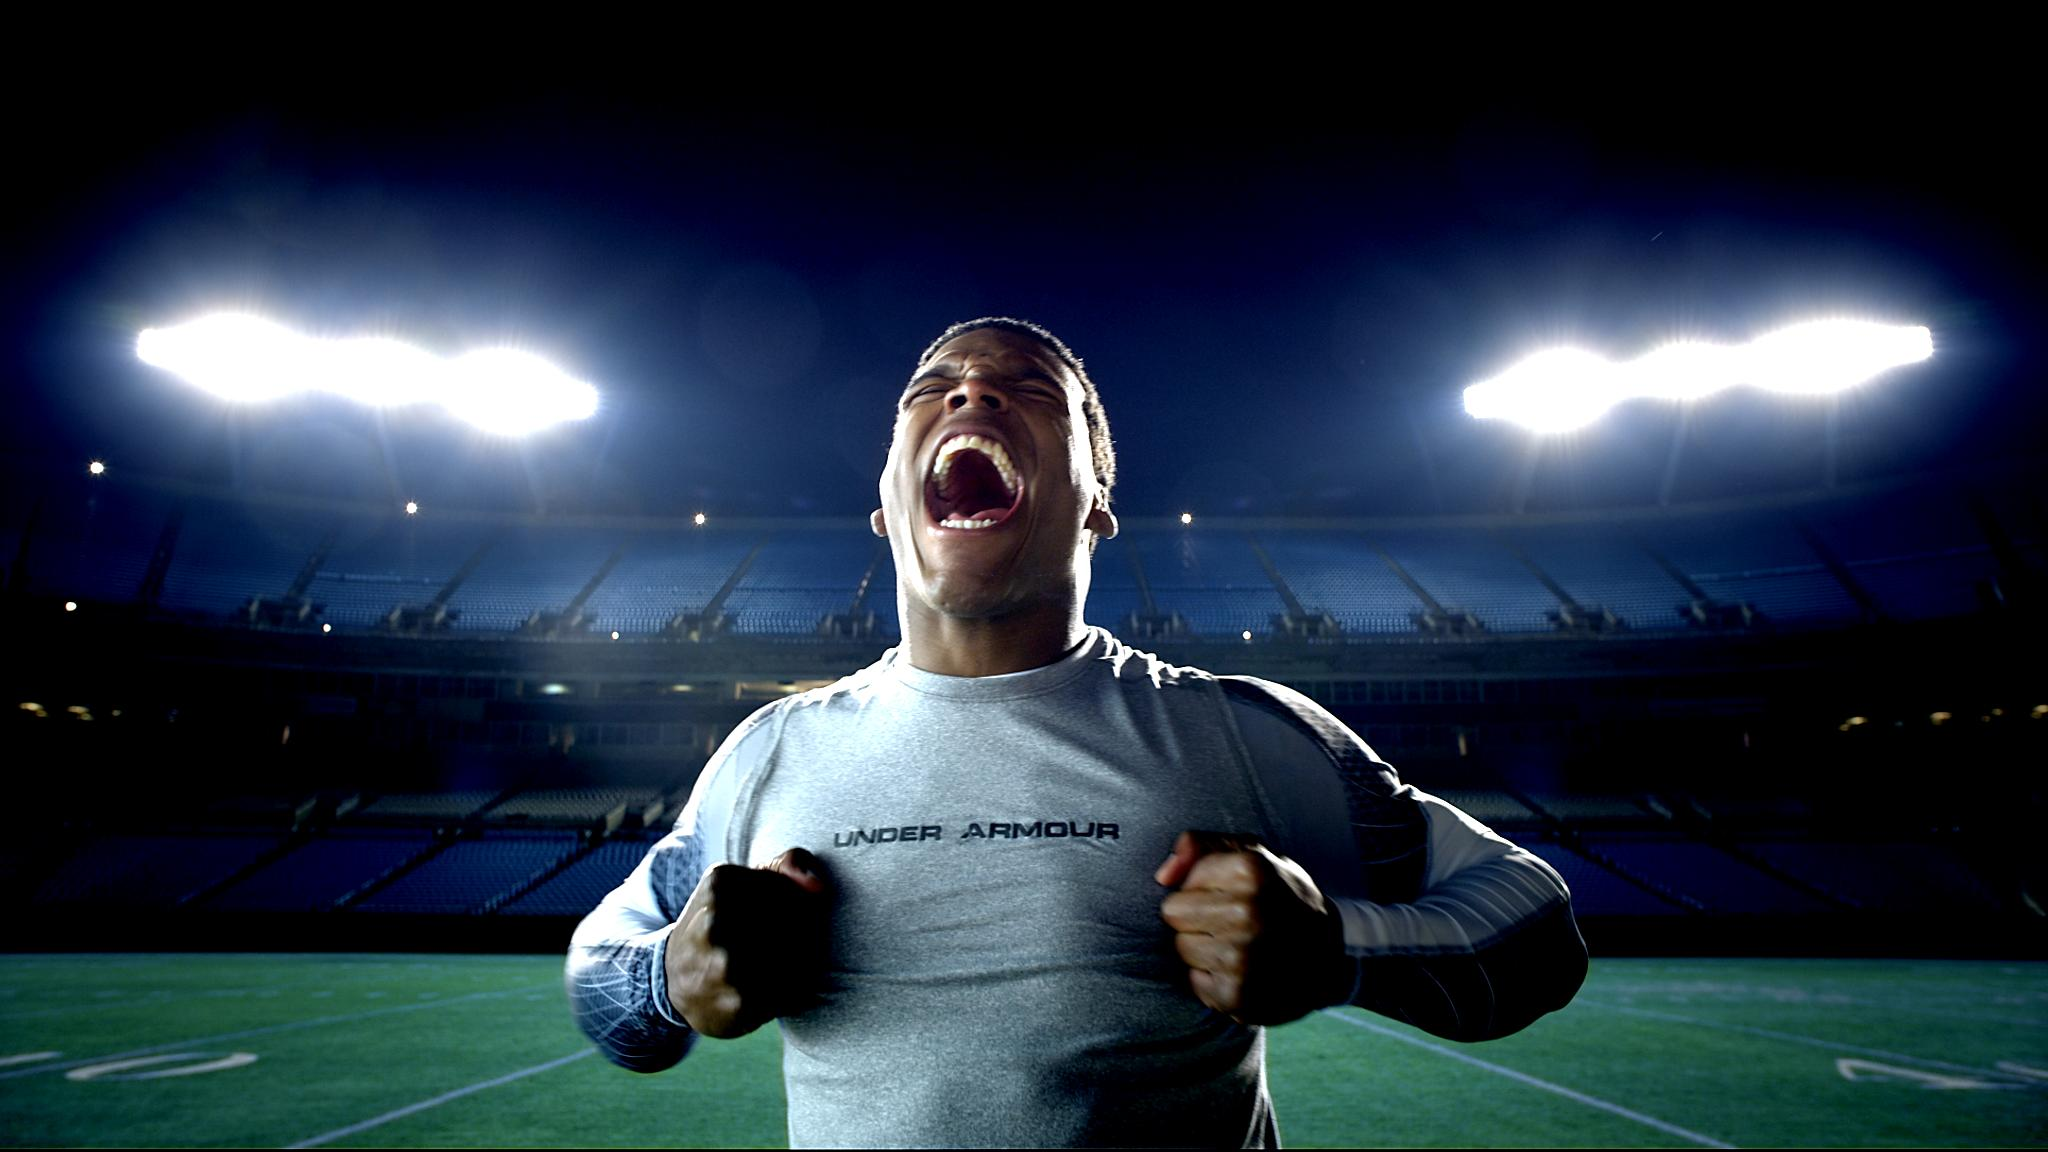 Cam Newton Joins AraabMuzik In New Under Armour Commercial [Video 2048x1152